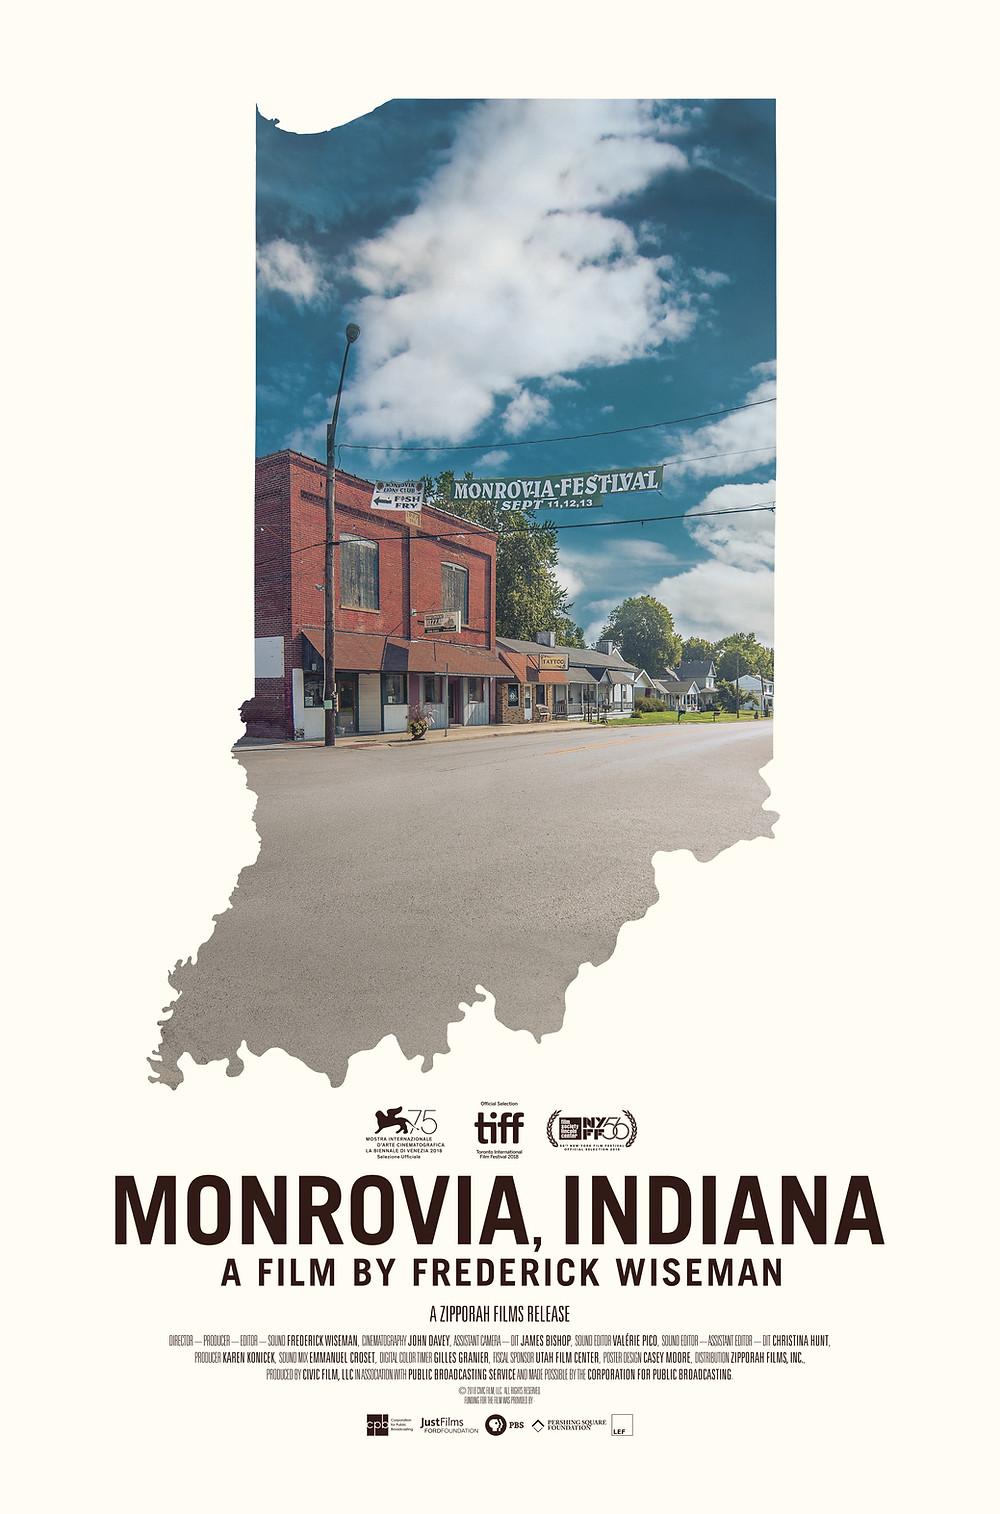 Frederick Wiseman, 'Monrovia, Indiana' Poster